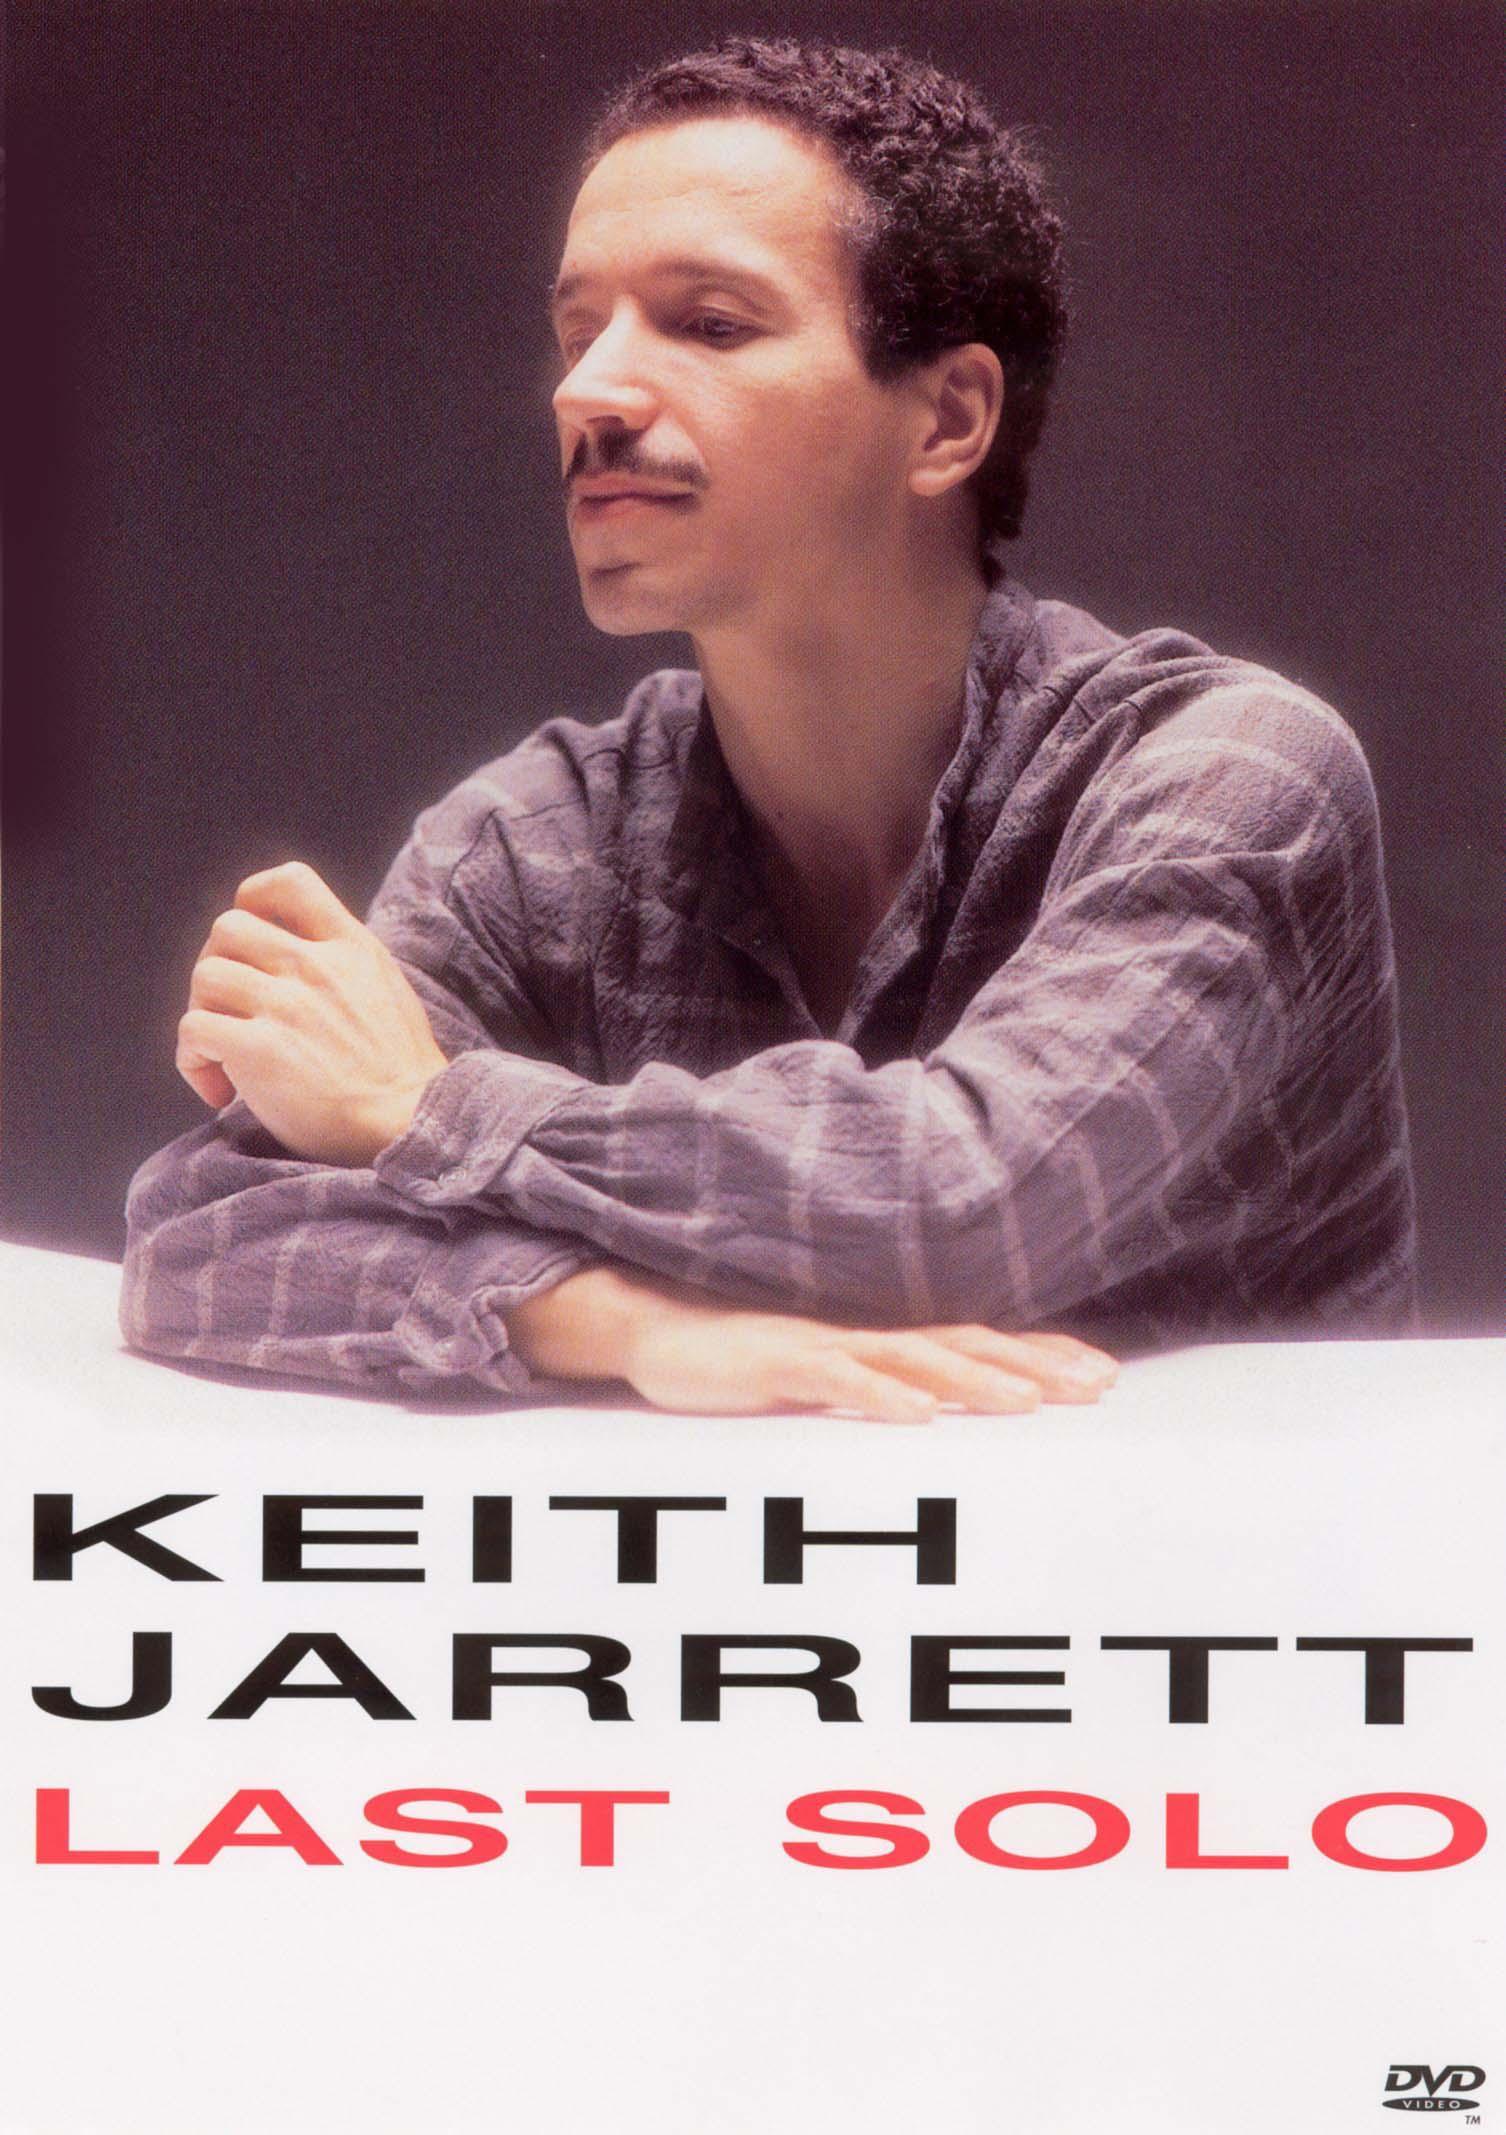 Keith Jarrett: Last Solo